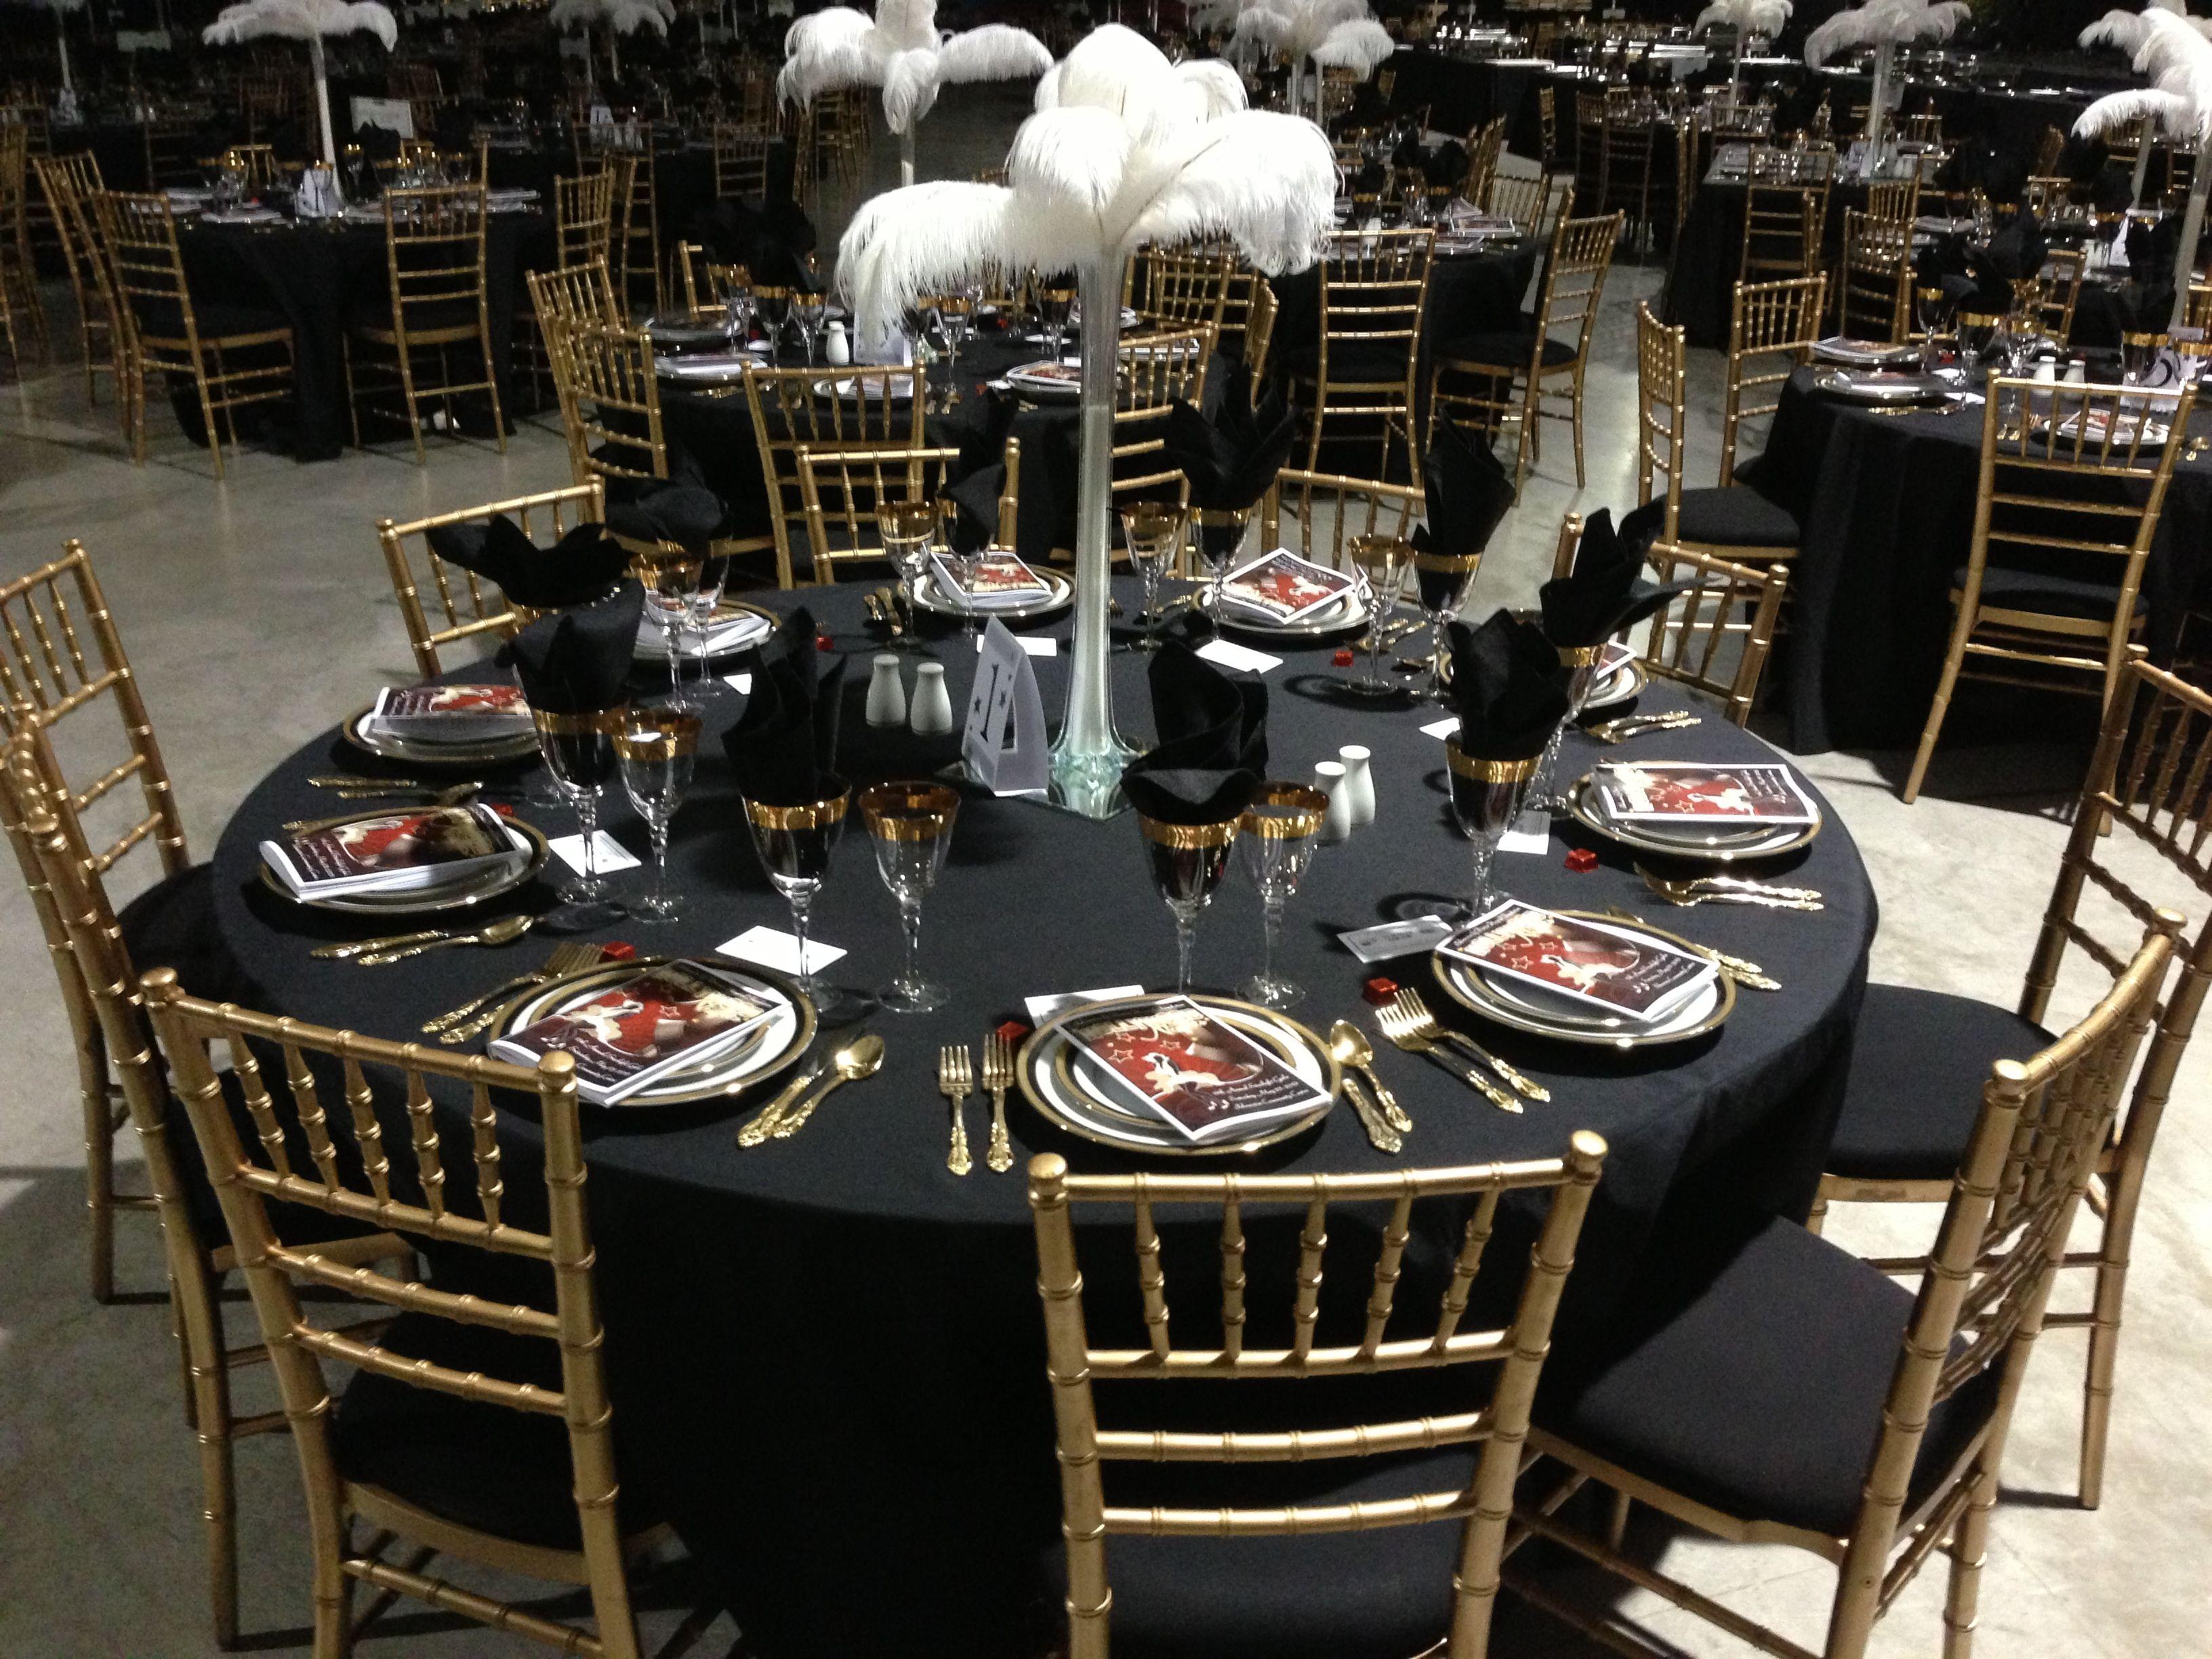 chiavari chairs wedding levon showood accent chair gold with black seat regal flatware